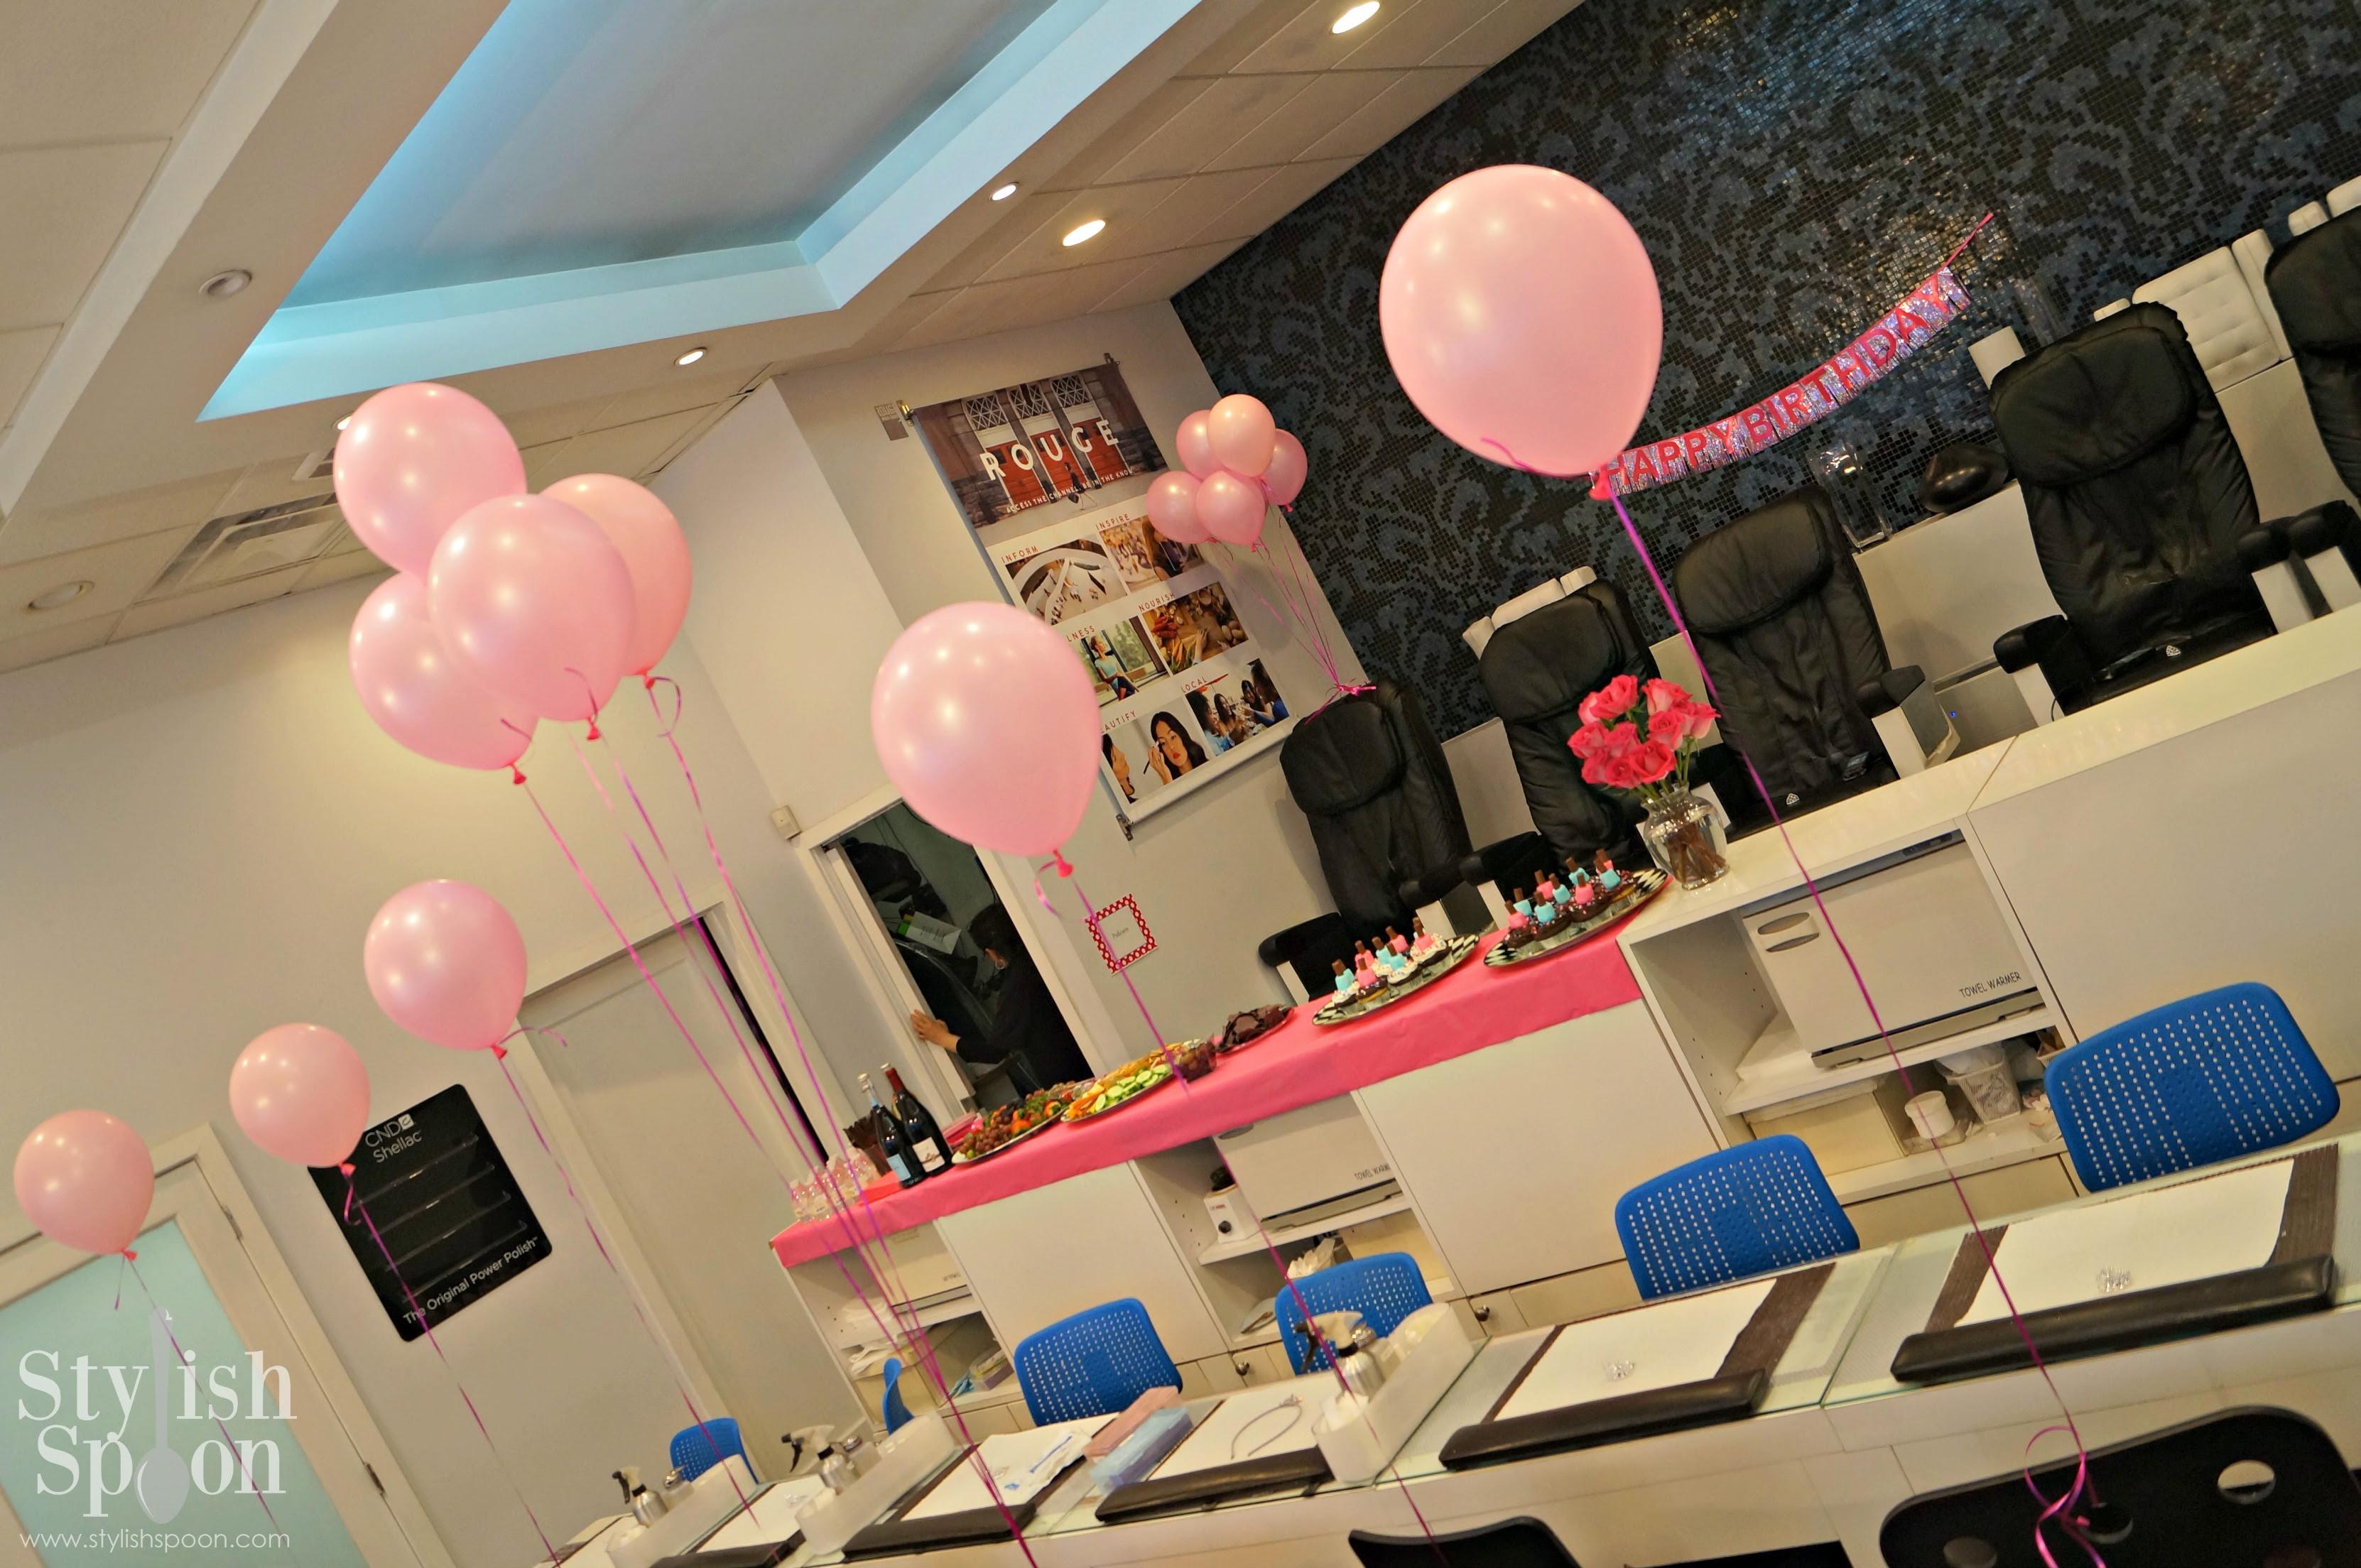 Salon Anniversary Decoration Ideas - NaturalSalons